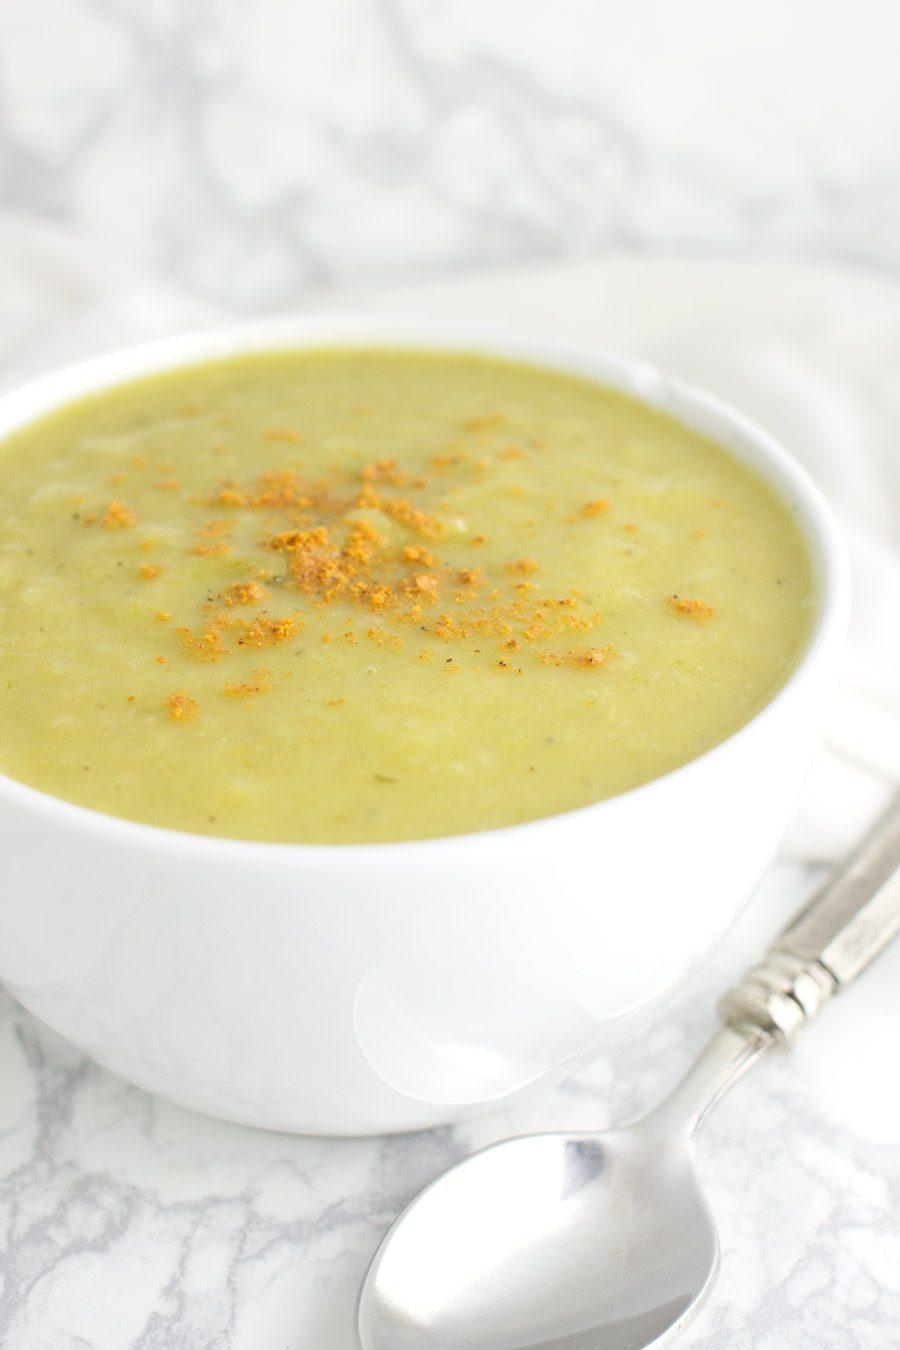 Celeriac Leek Soup recipe from acleanplate.com #paleo #aip #autoimmuneprotocol